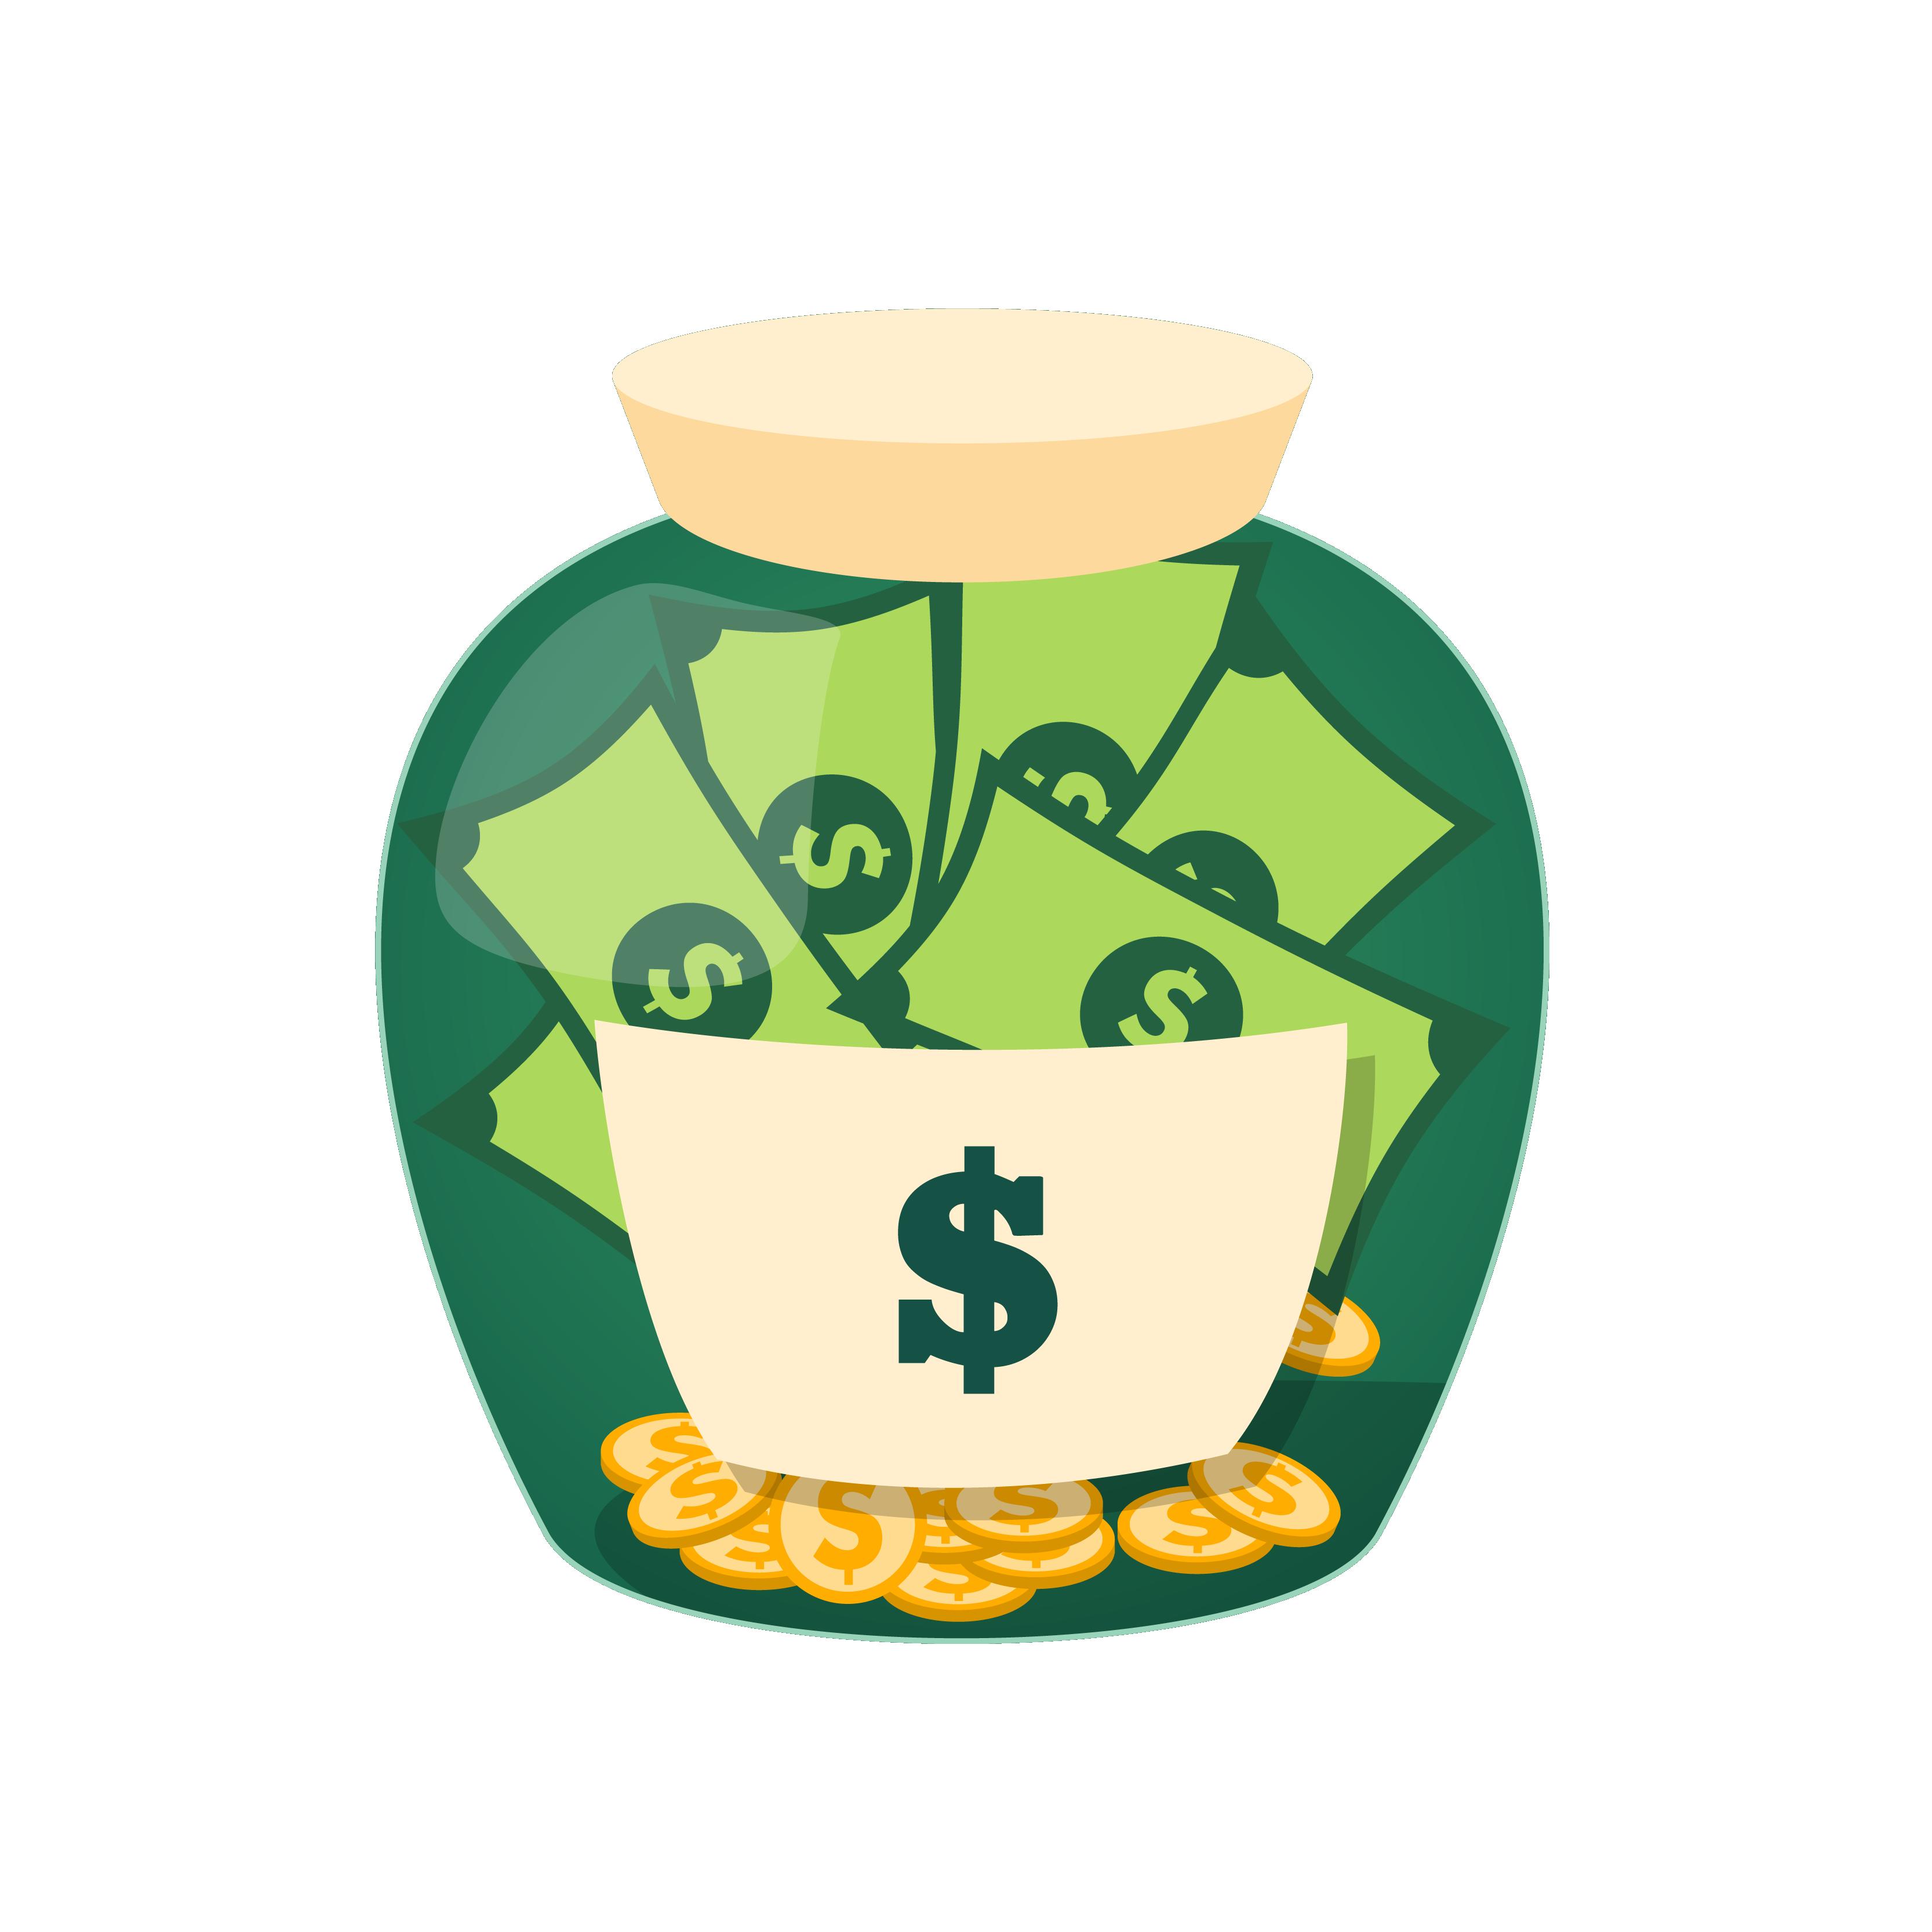 Money in glass cup clipart jpg royalty free library Money Jar Saving Clip art - Money jar 3333*3333 transprent Png Free ... jpg royalty free library